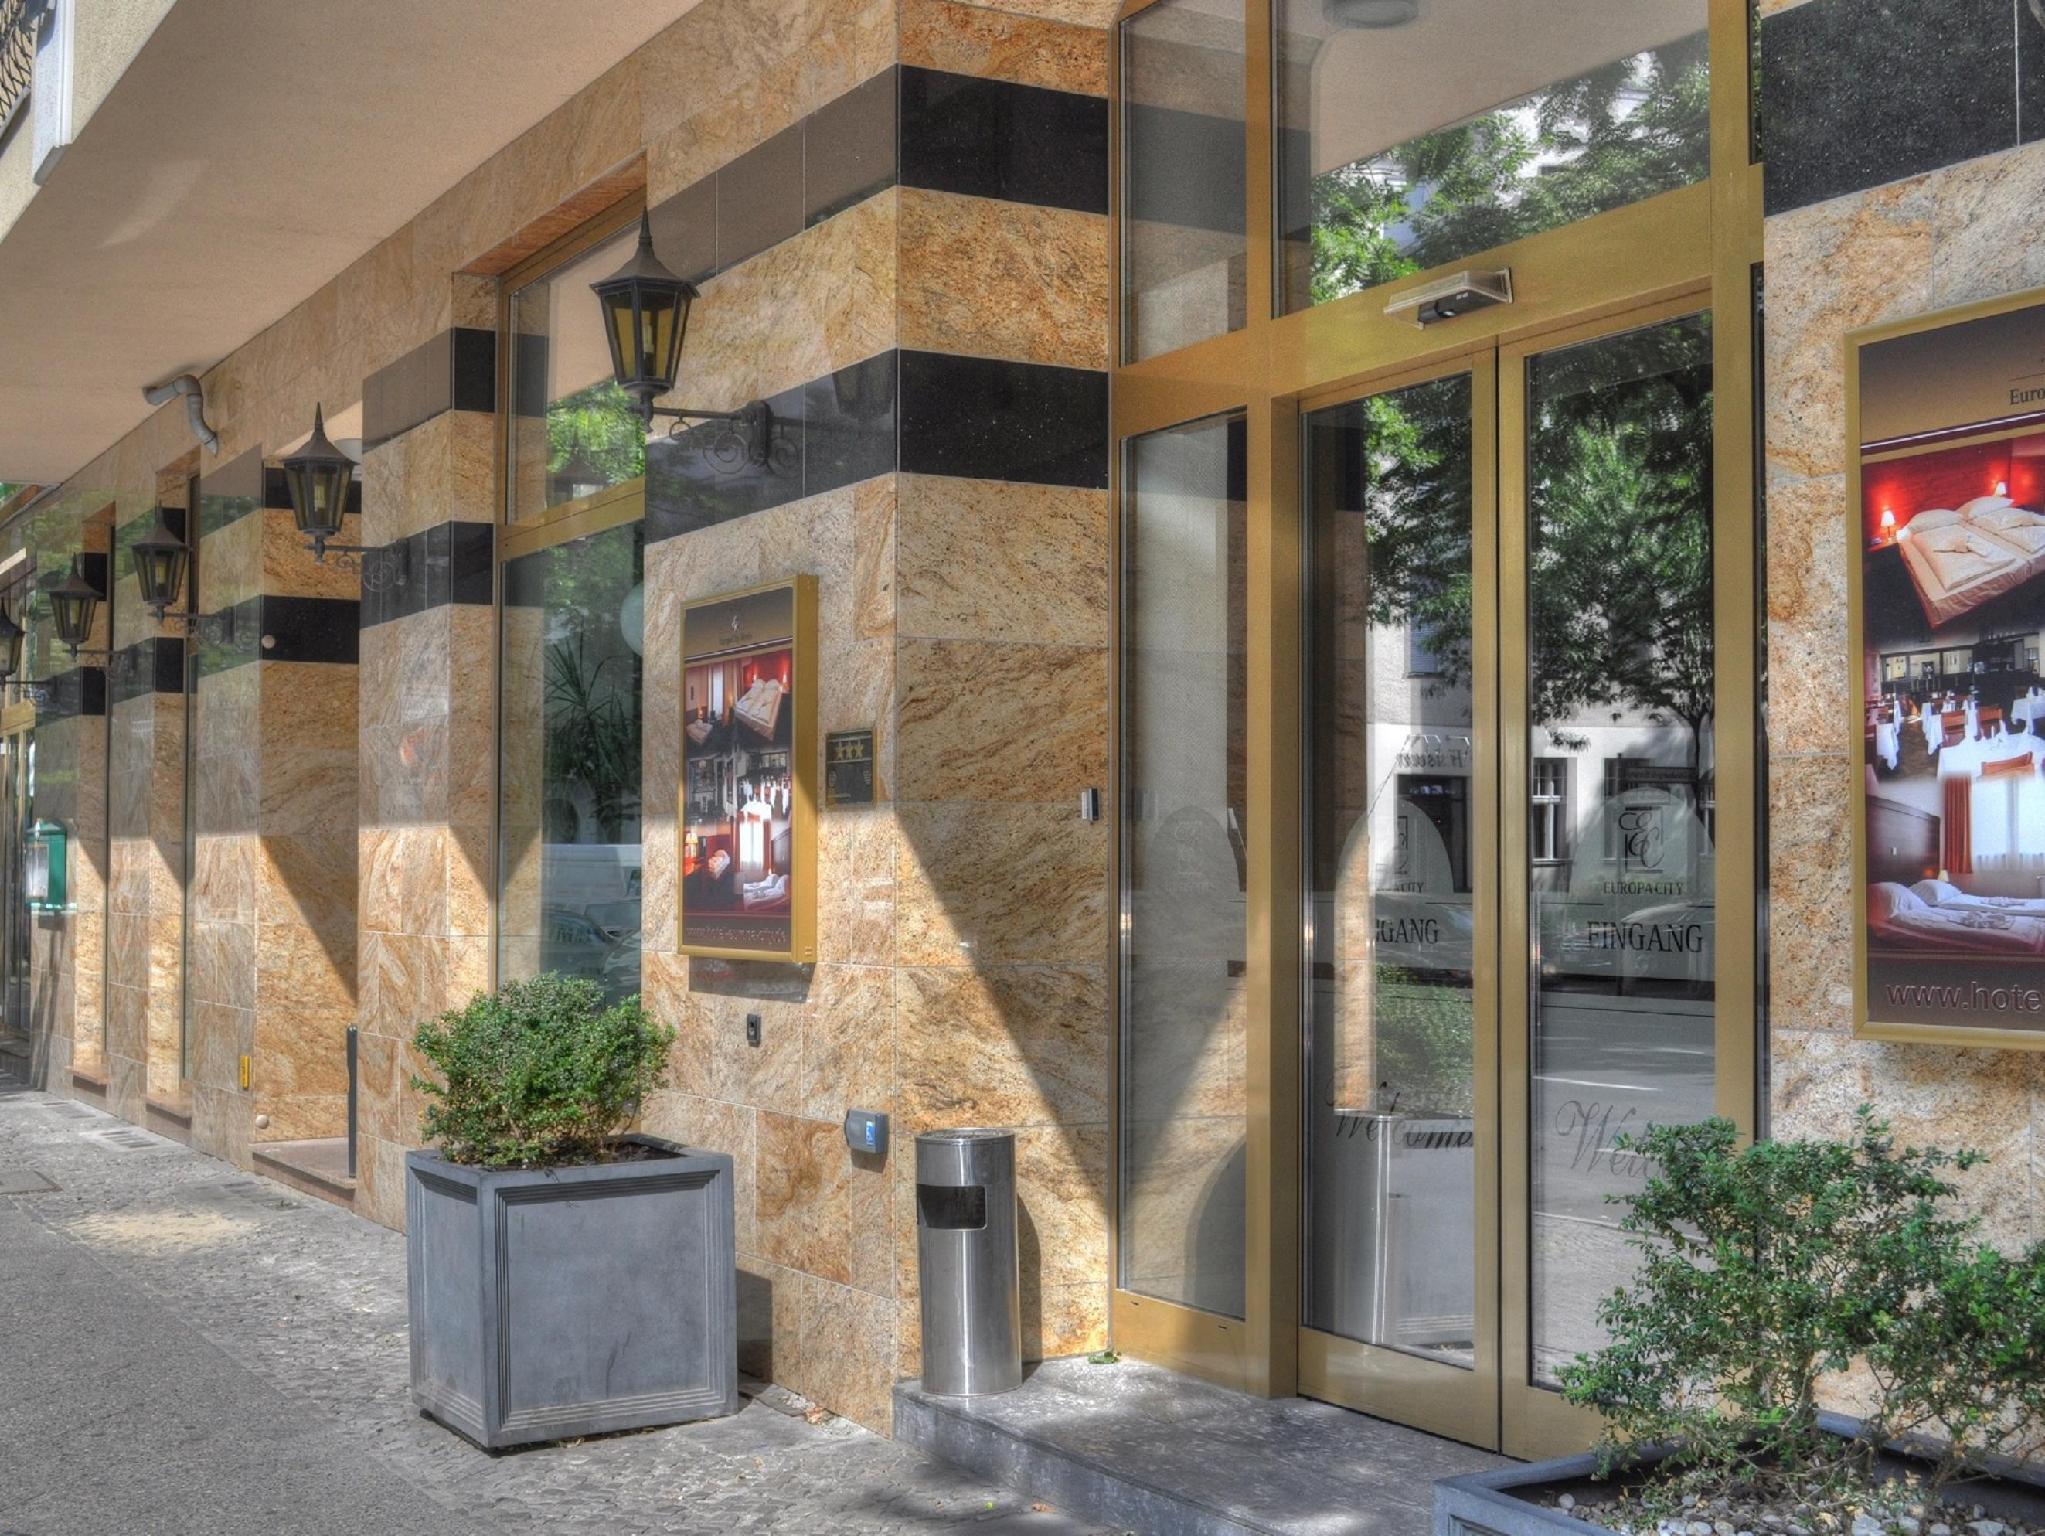 Hotel Europa City - Hotell och Boende i Tyskland i Europa